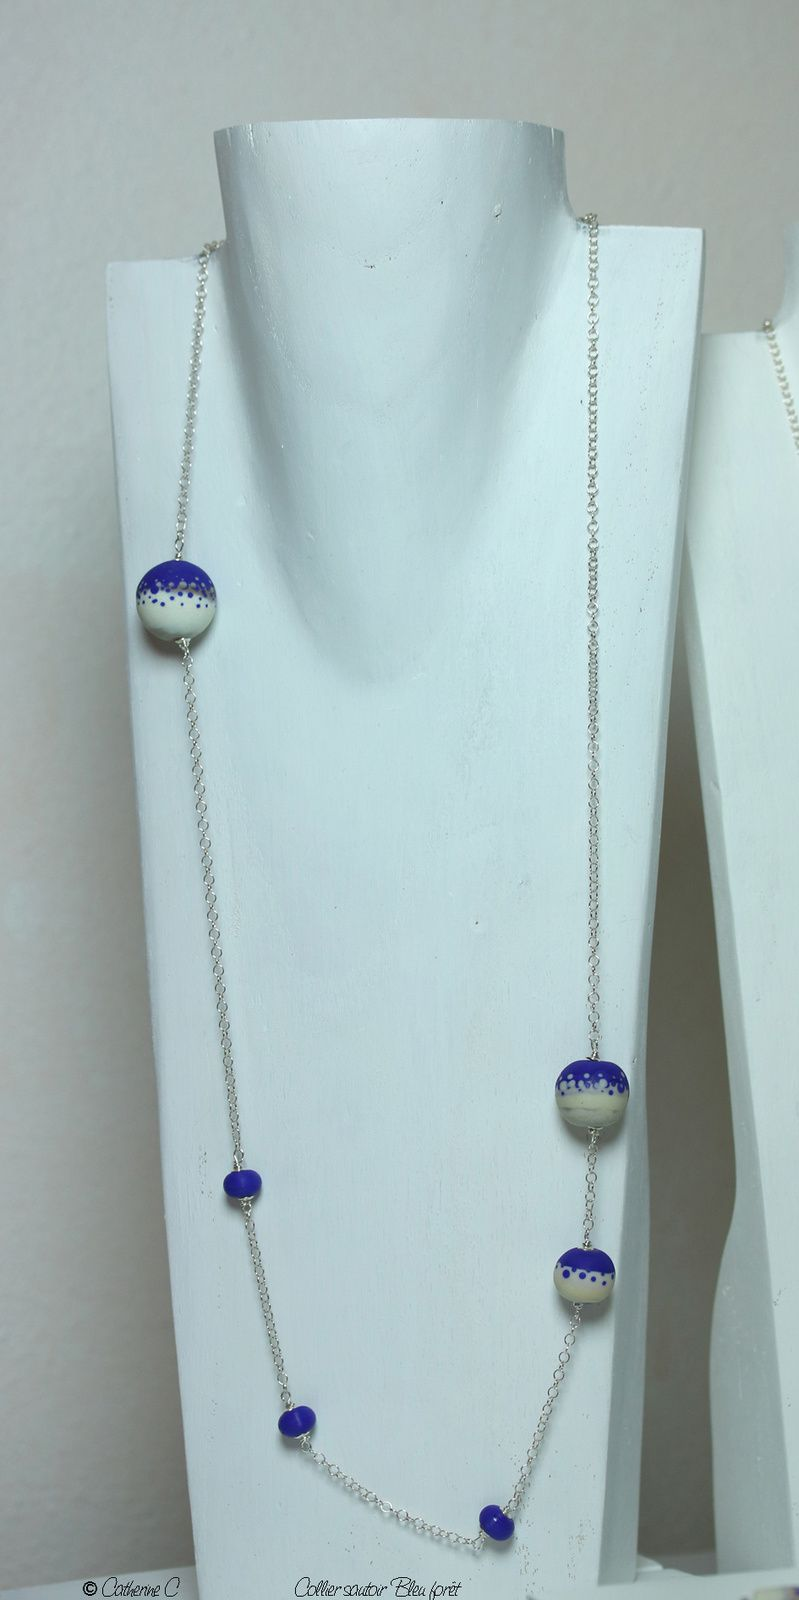 Collier sautoir Bleu forêt